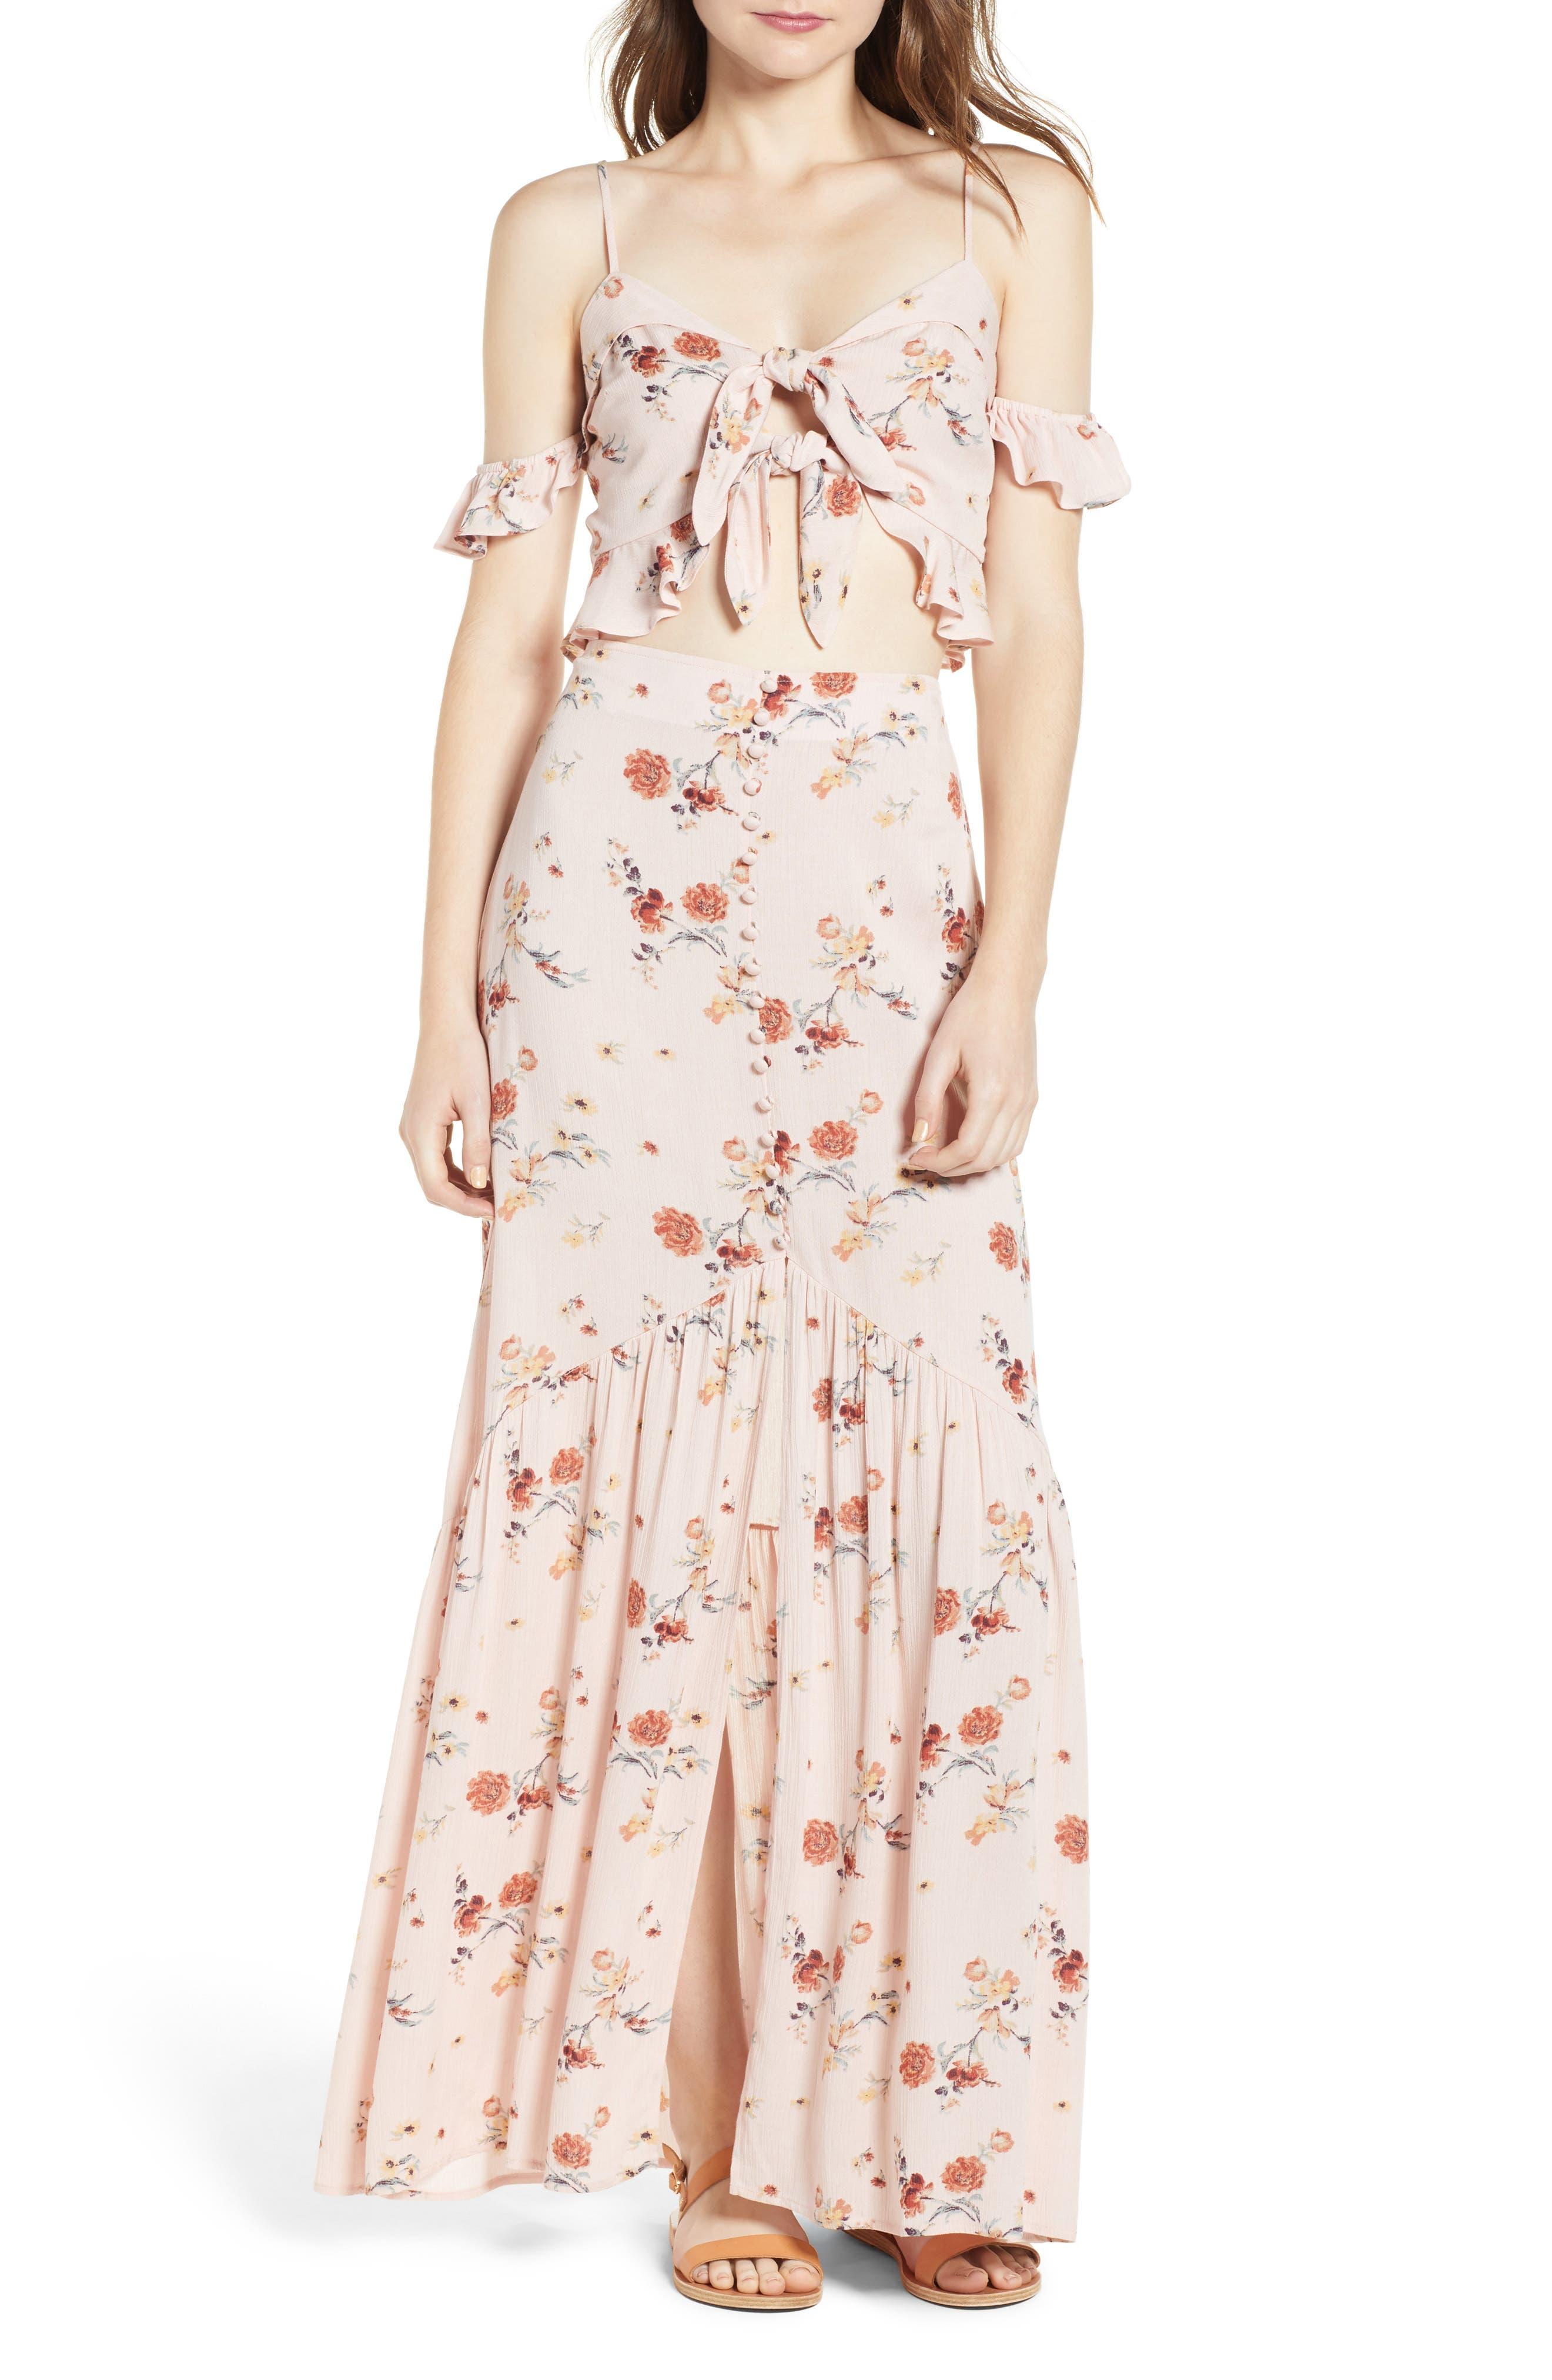 Rosa Floral Maxi Skirt,                             Alternate thumbnail 8, color,                             Pink Floral